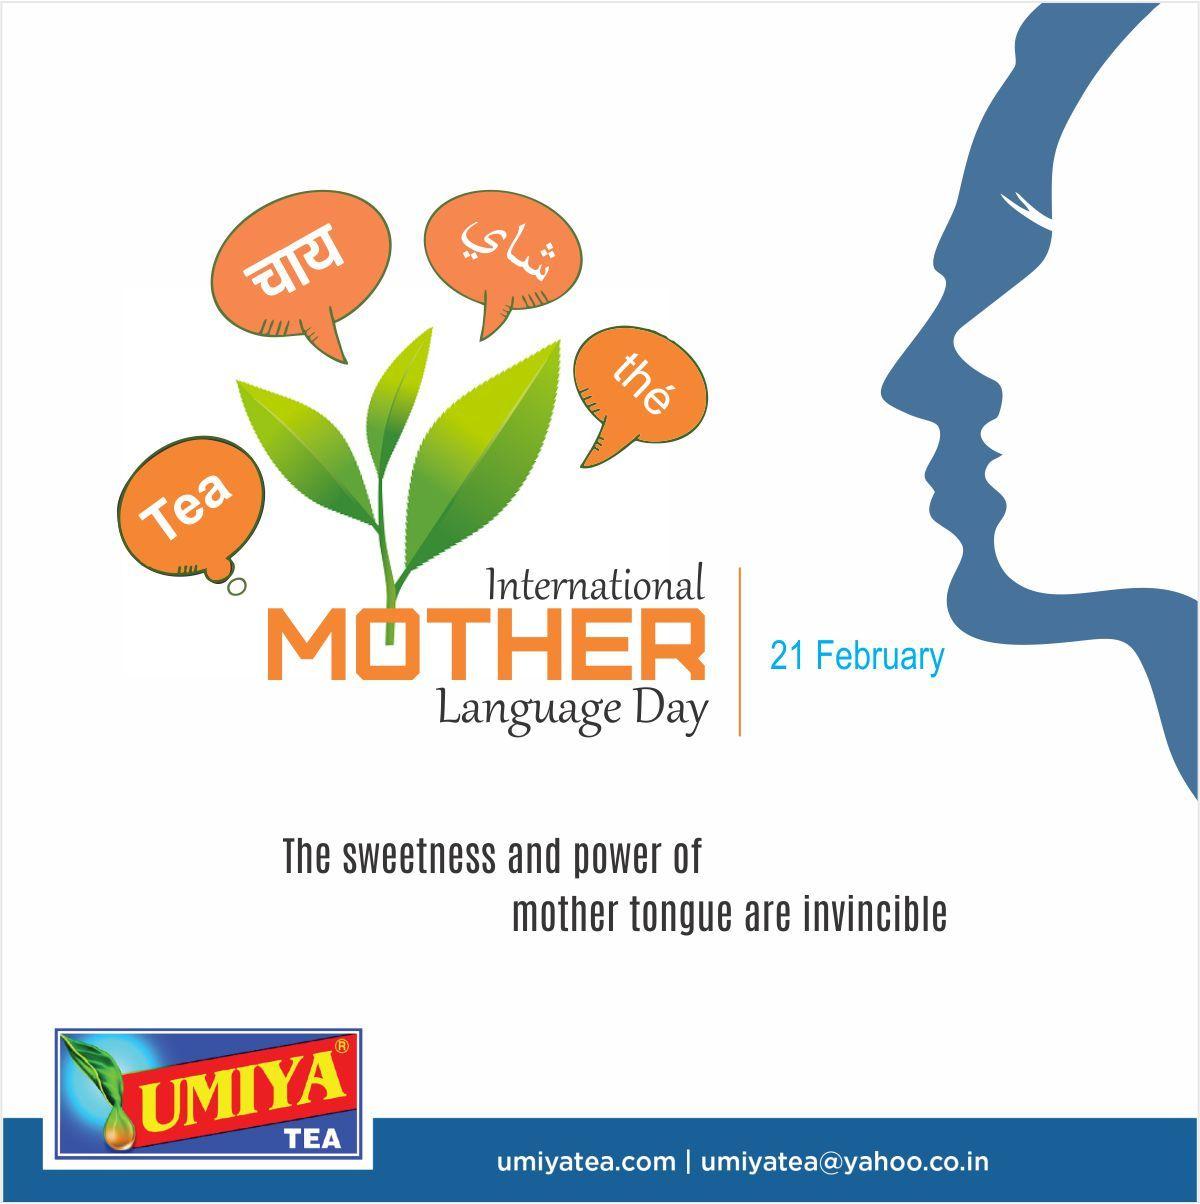 The Sweetness And Power Of Mother Tongue Are Invincible International Mother Language Day Umiya Tea Umiyatea Motherlanguageday Pinterest